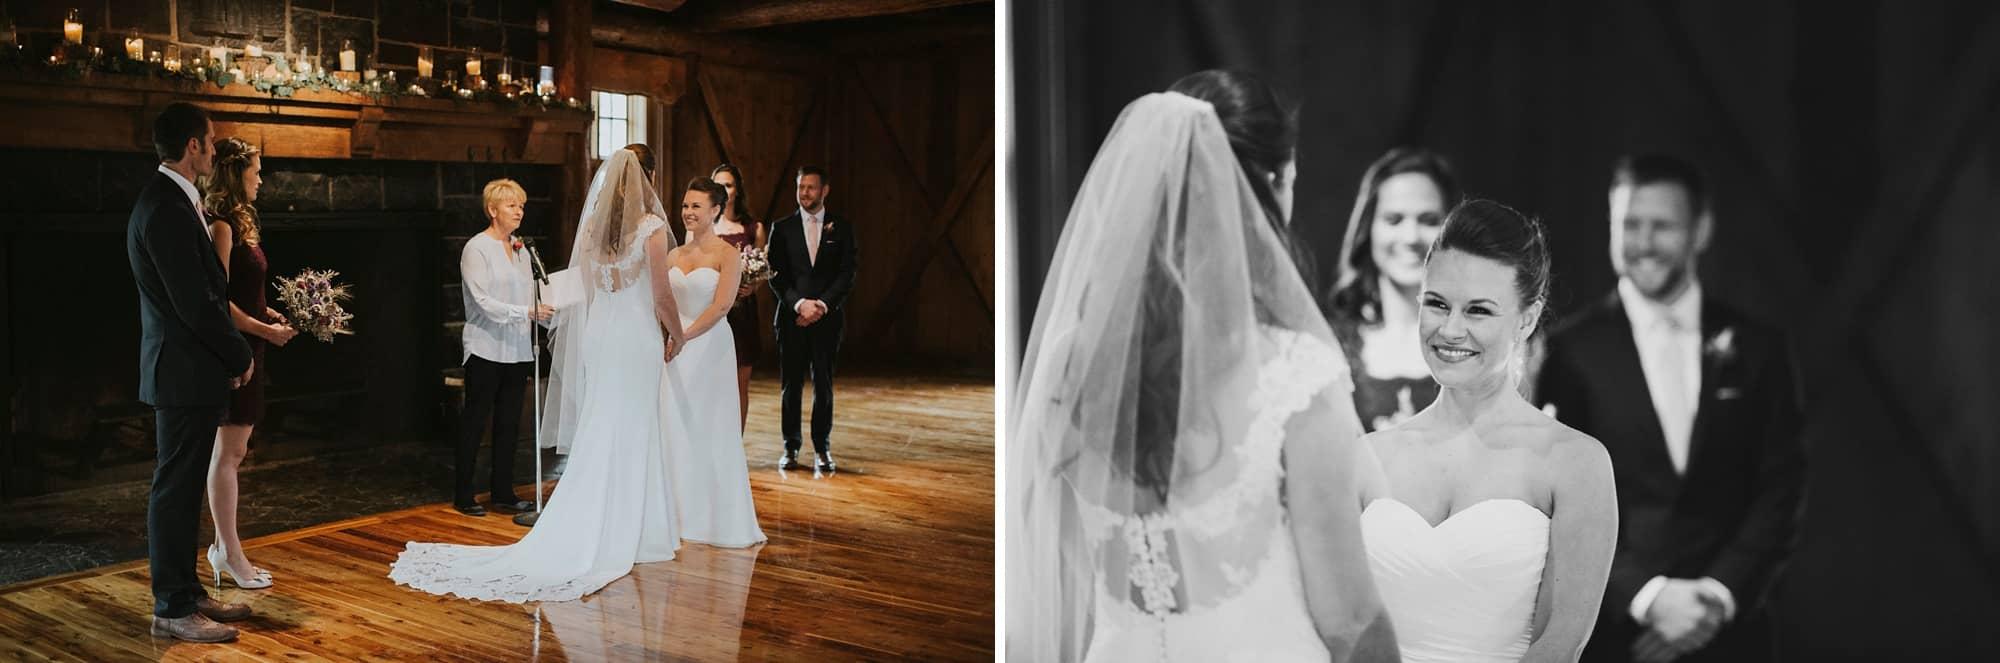 Sara Emily Sunriver Bend Oregon Rustic Lodge Wedding 0042